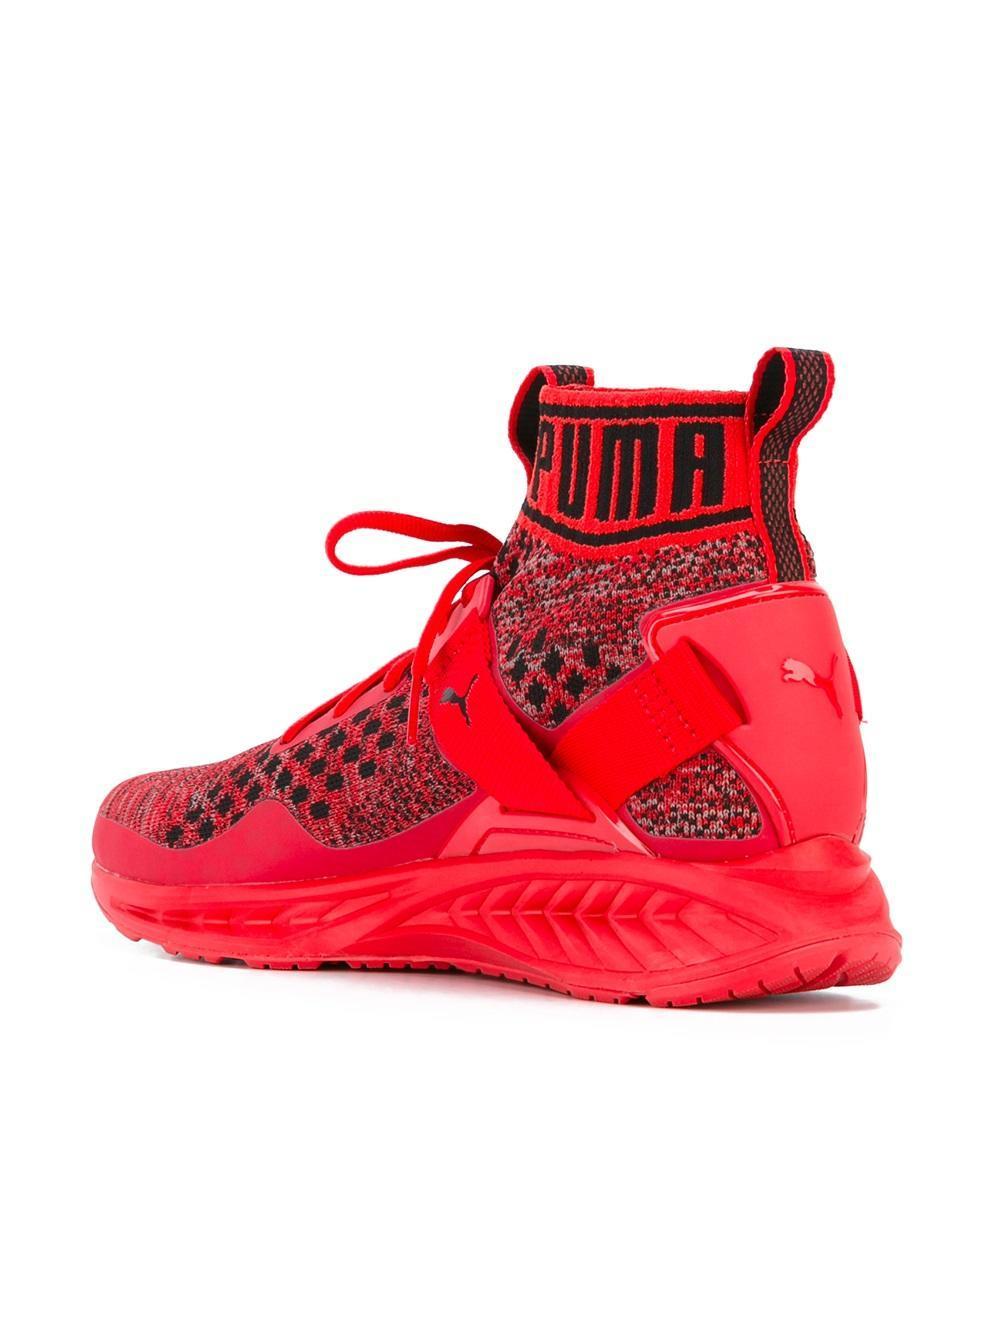 Puma Ankle Shoes For Men